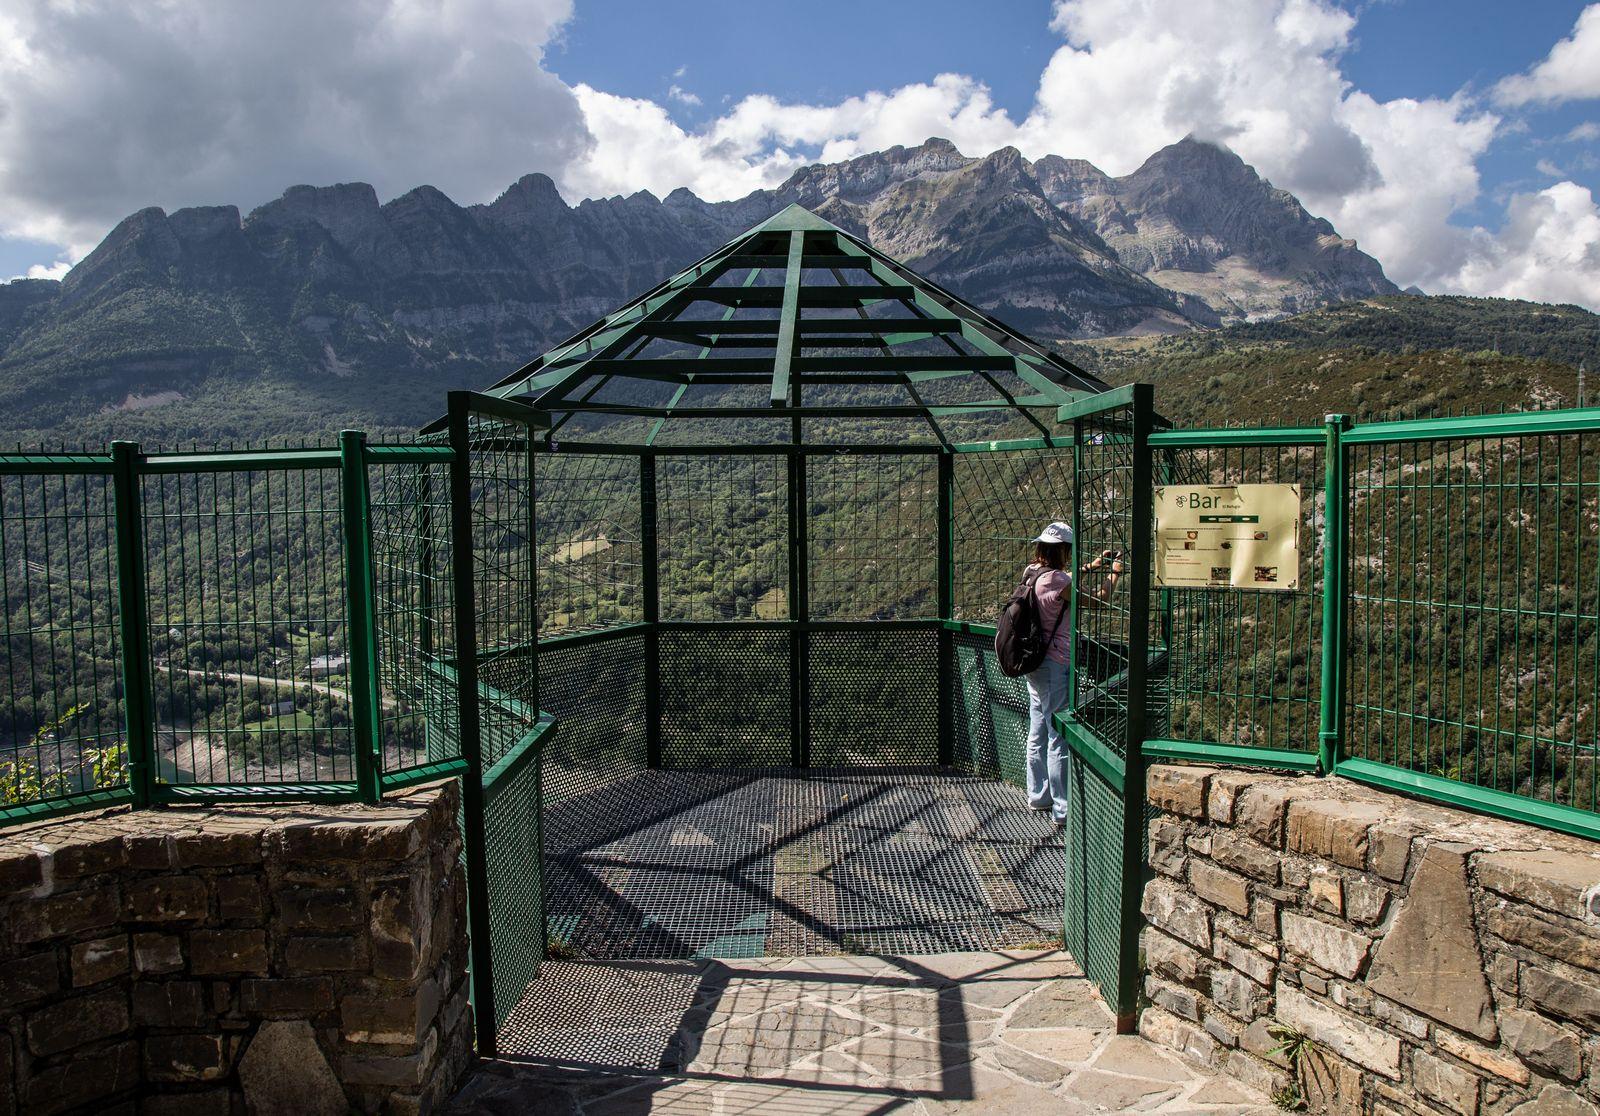 La jaula-mirador